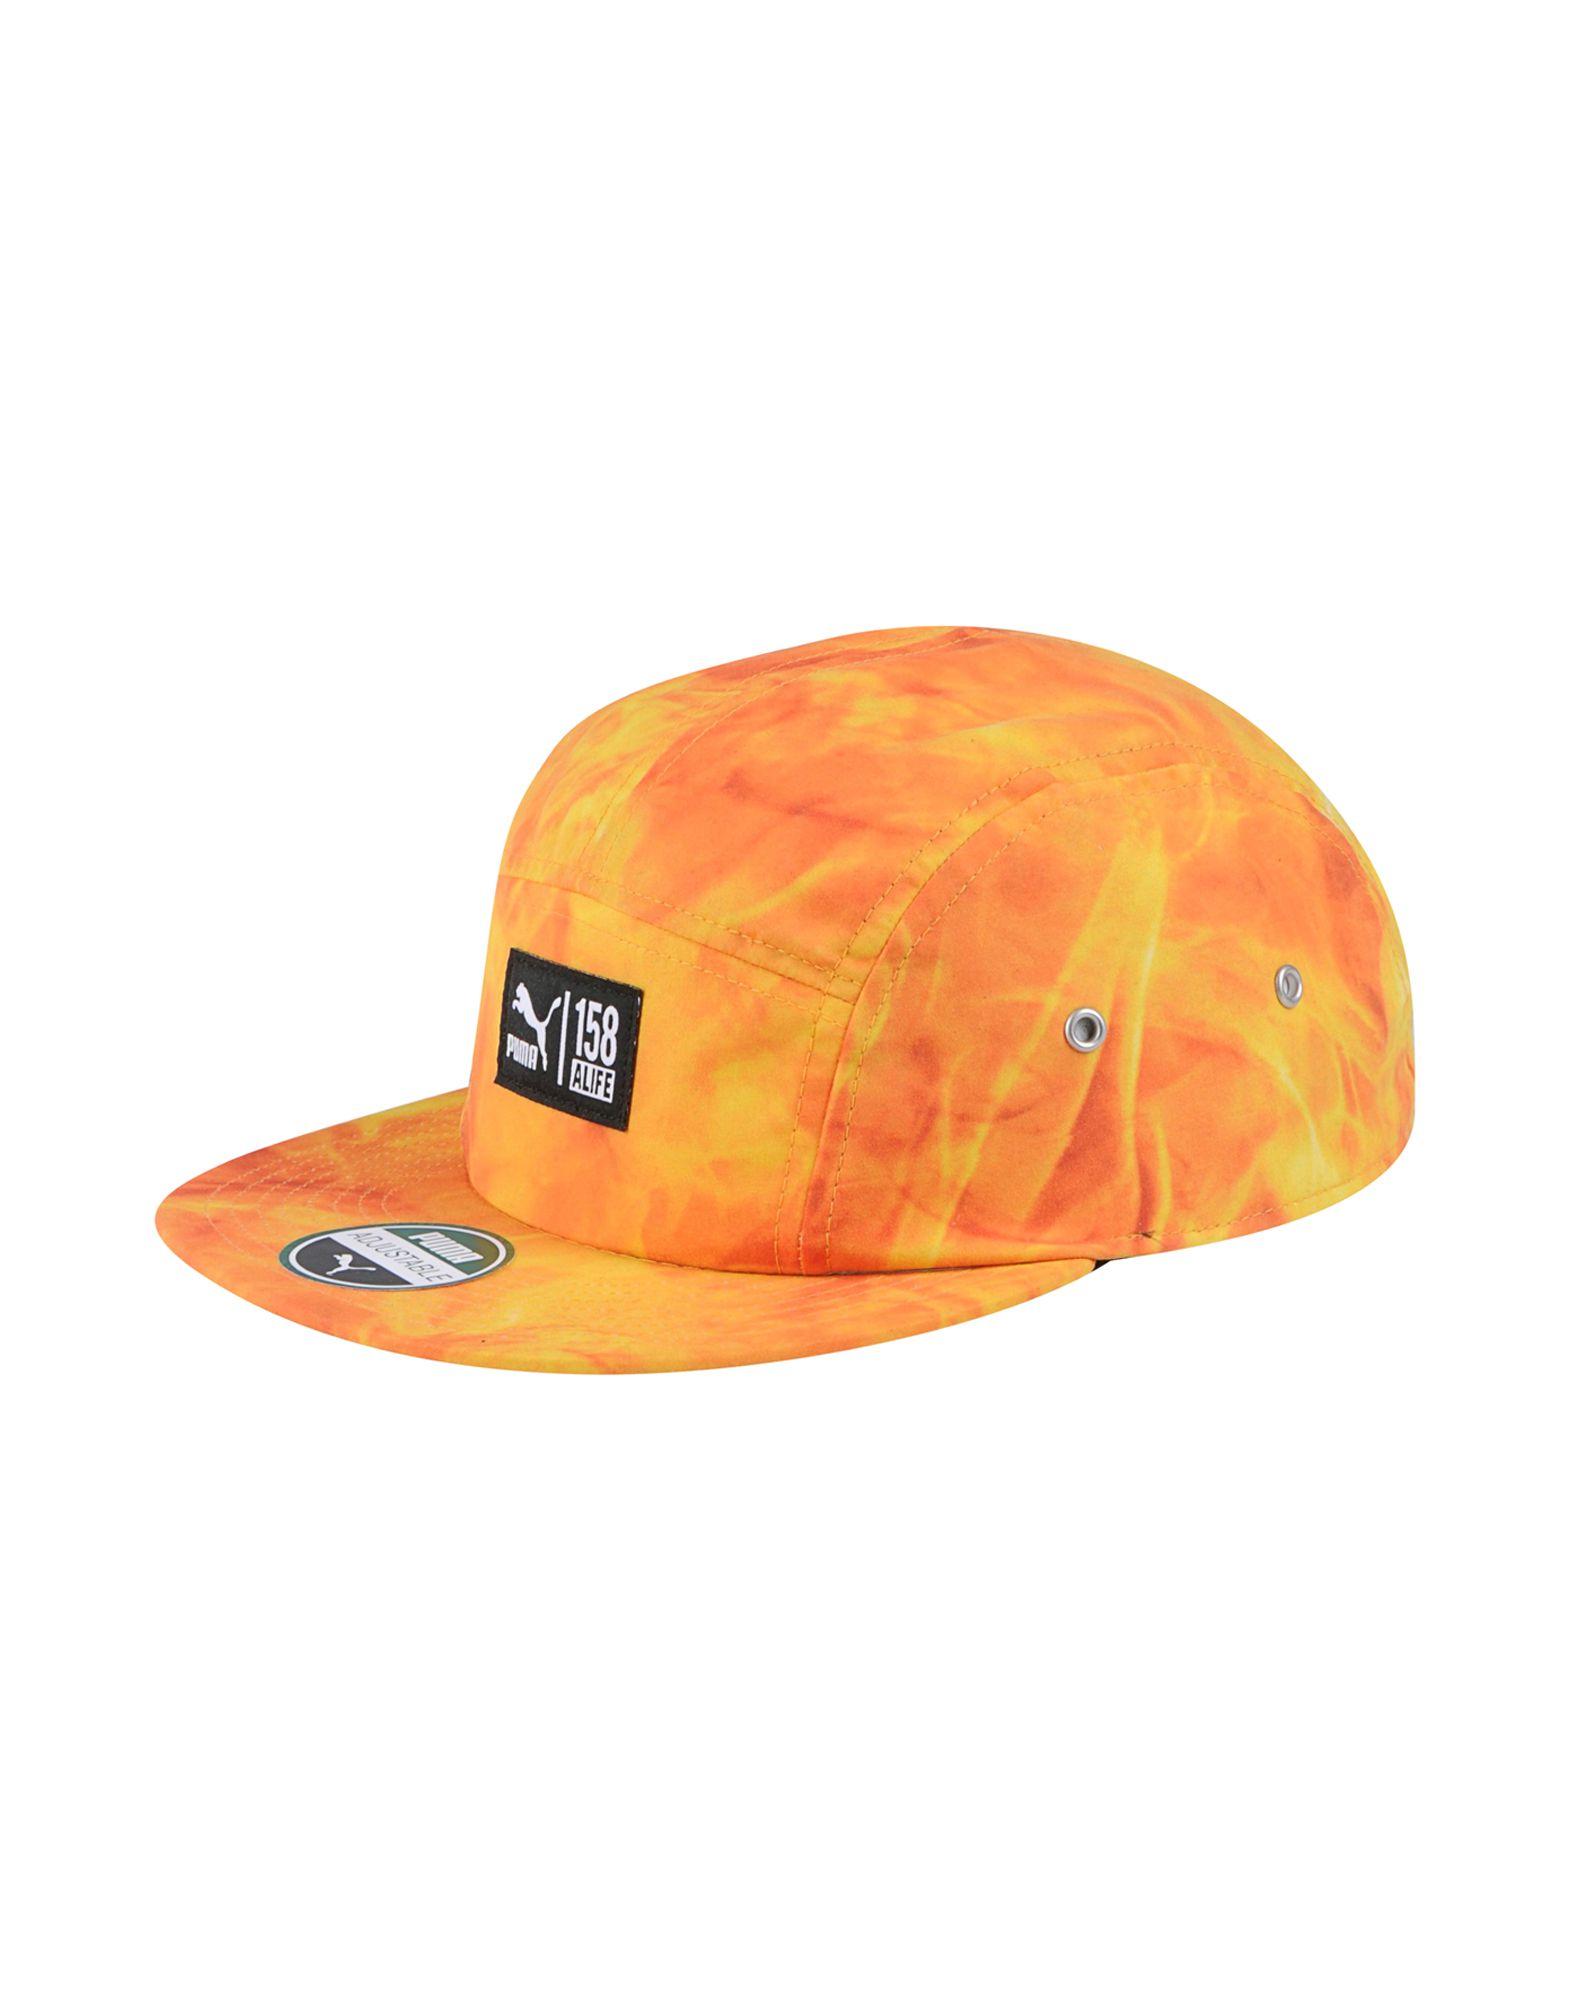 PUMA ALIFE Hats